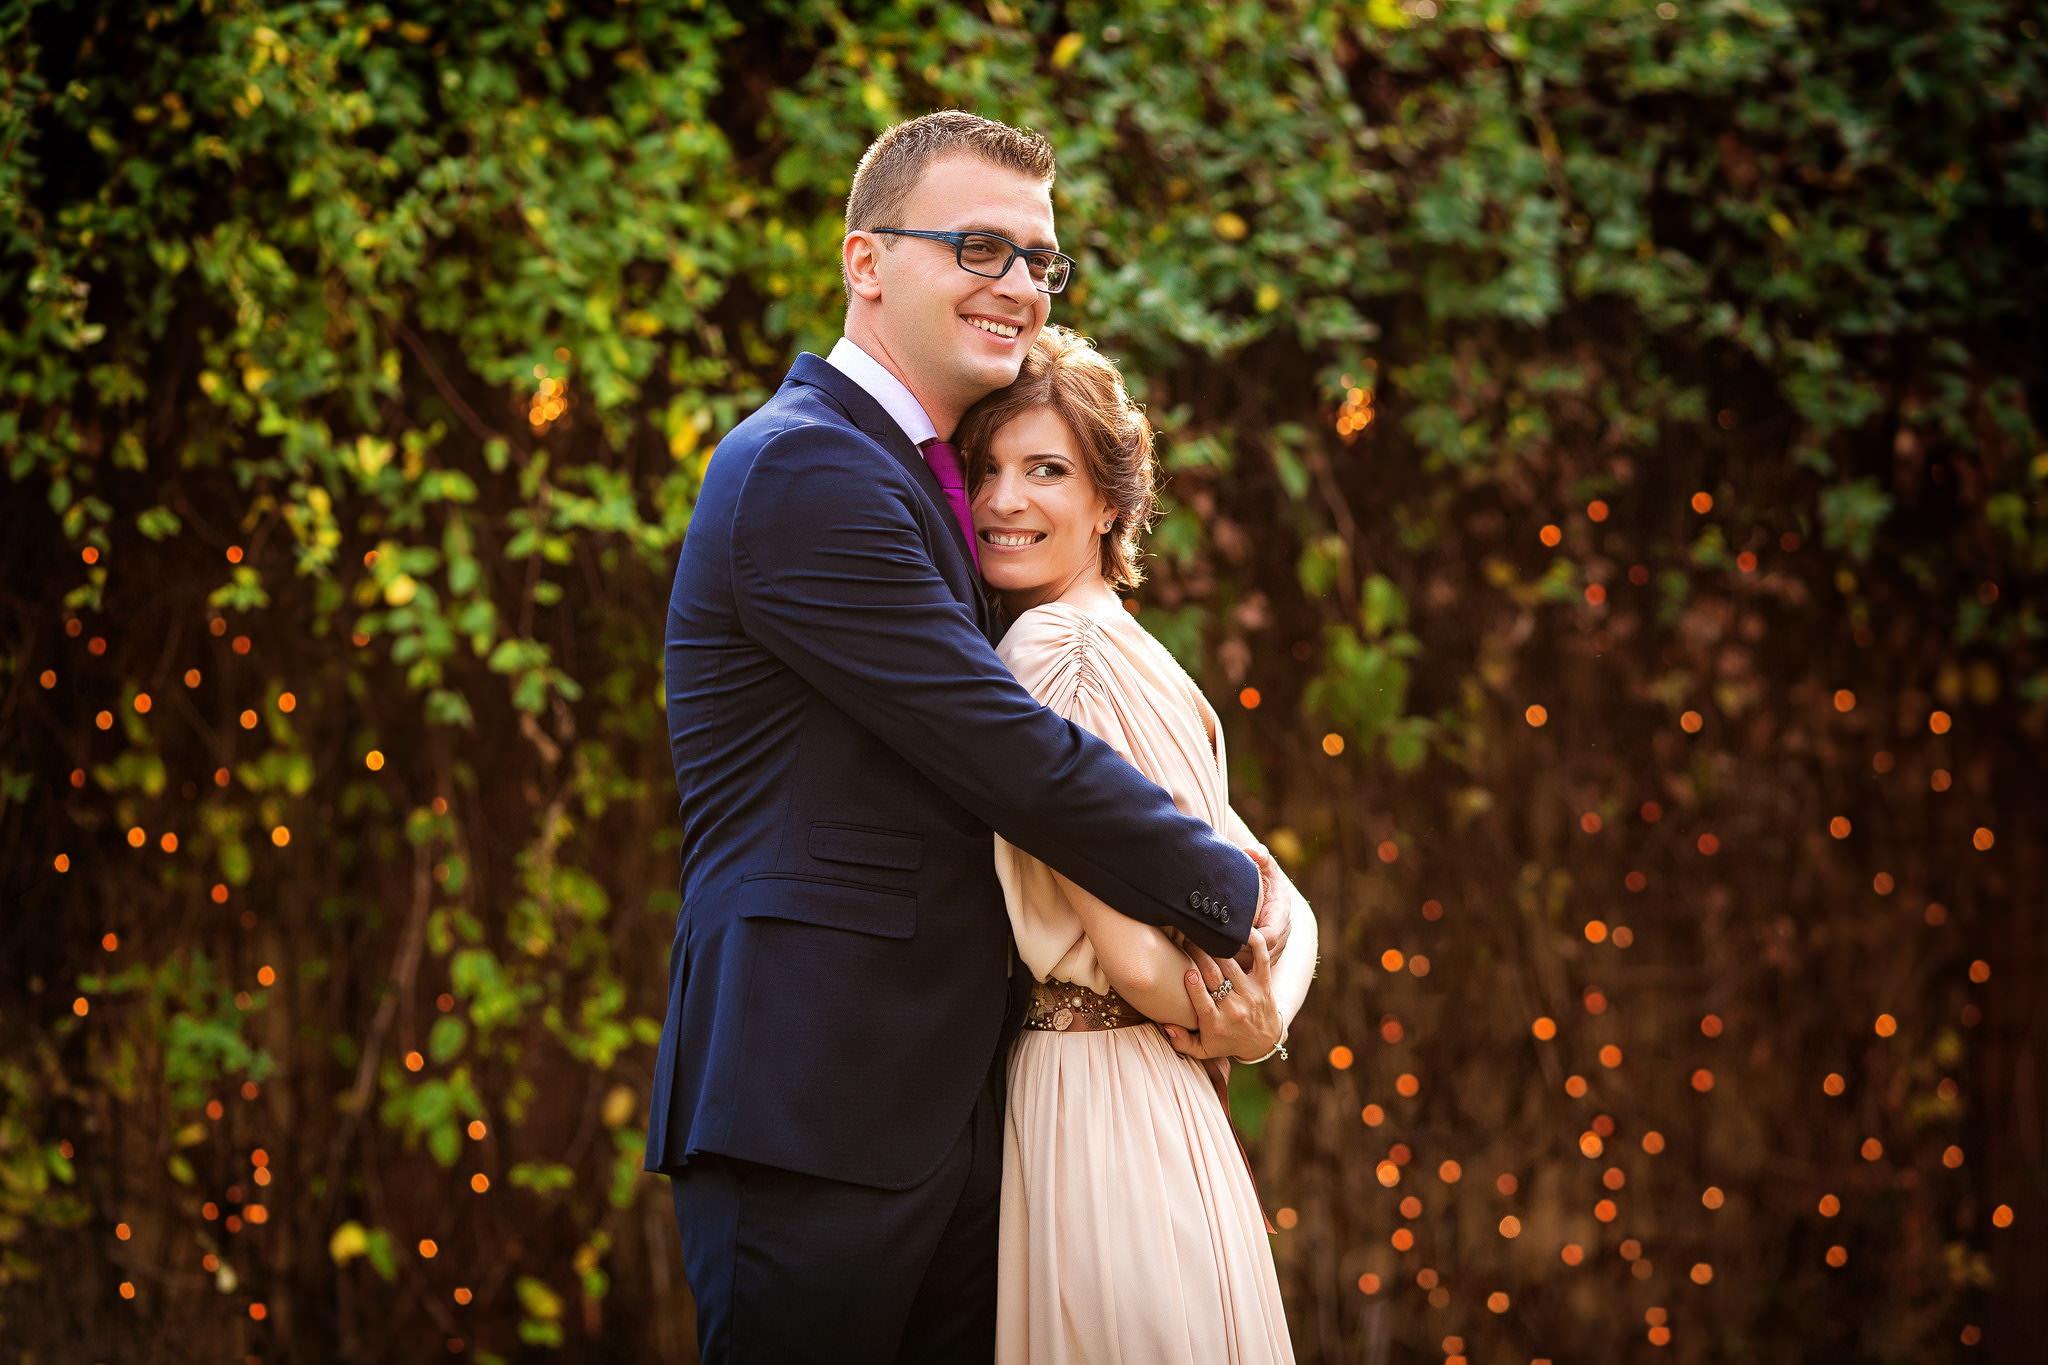 Ioana+ Doru, fotografie de nunta, fotograf Bucuresti, fotograf profesionist, wedding, sedinta foto, fotografie creativa, nunta